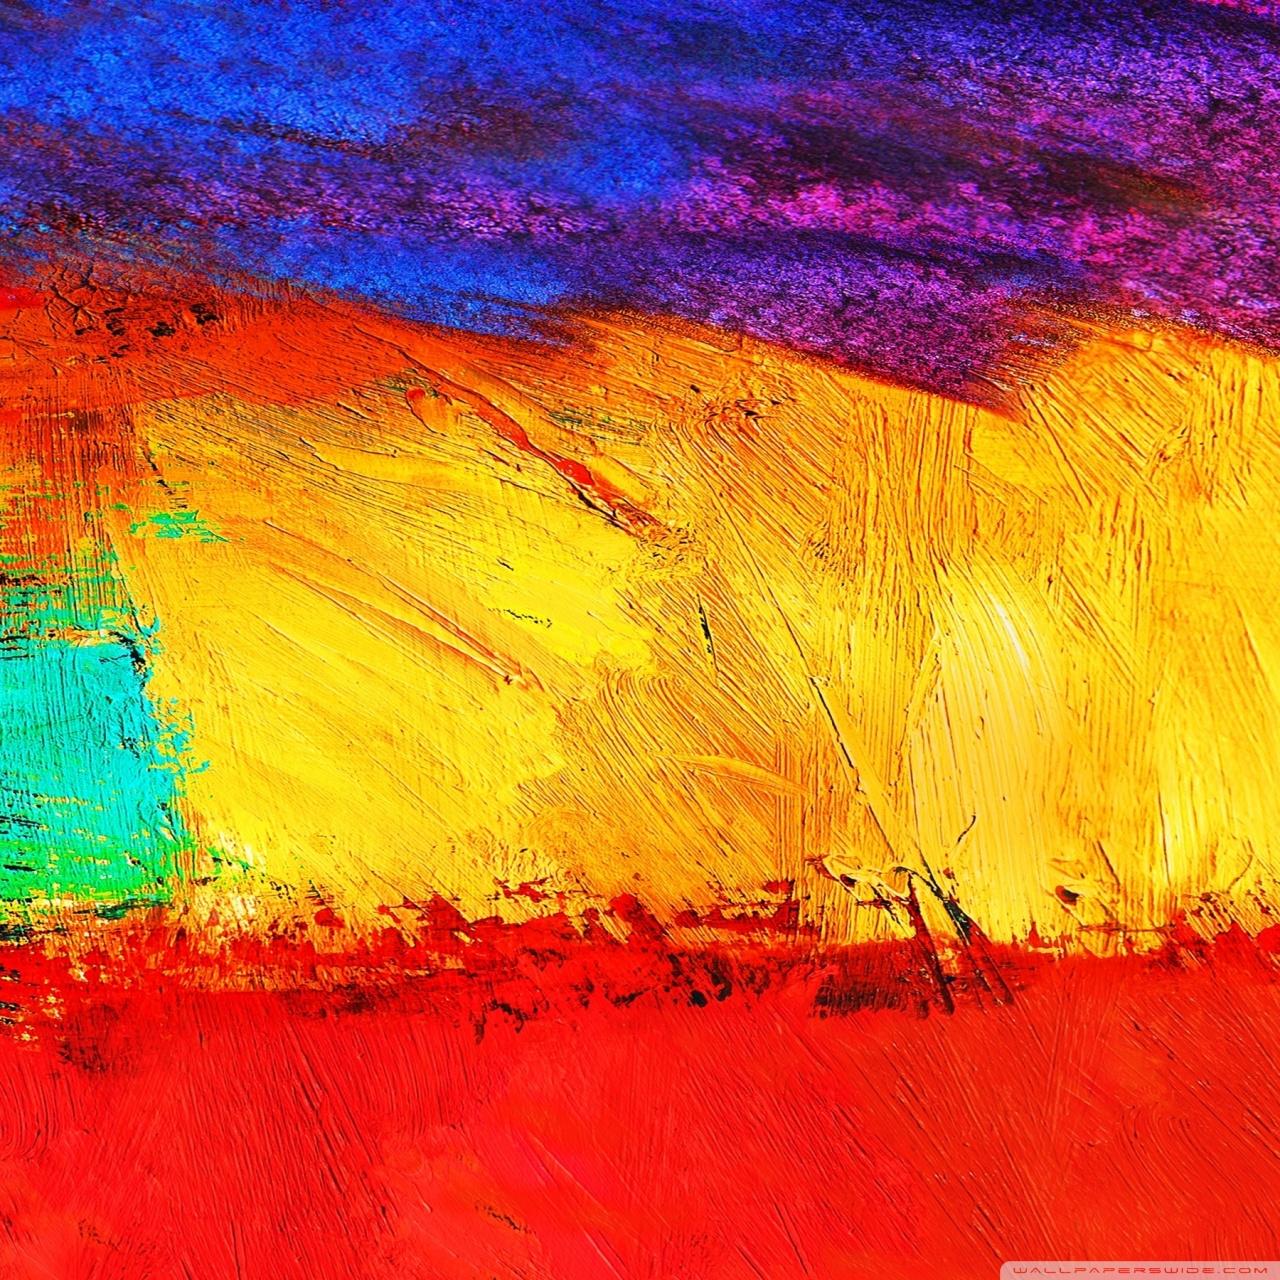 Ipad Samsung Galaxy Note 908041 Hd Wallpaper Backgrounds